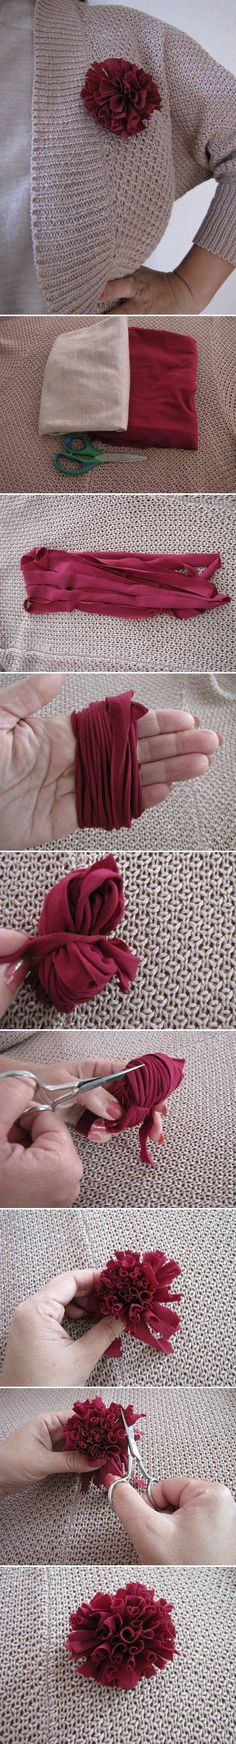 DIY Simple Fabric Brooch